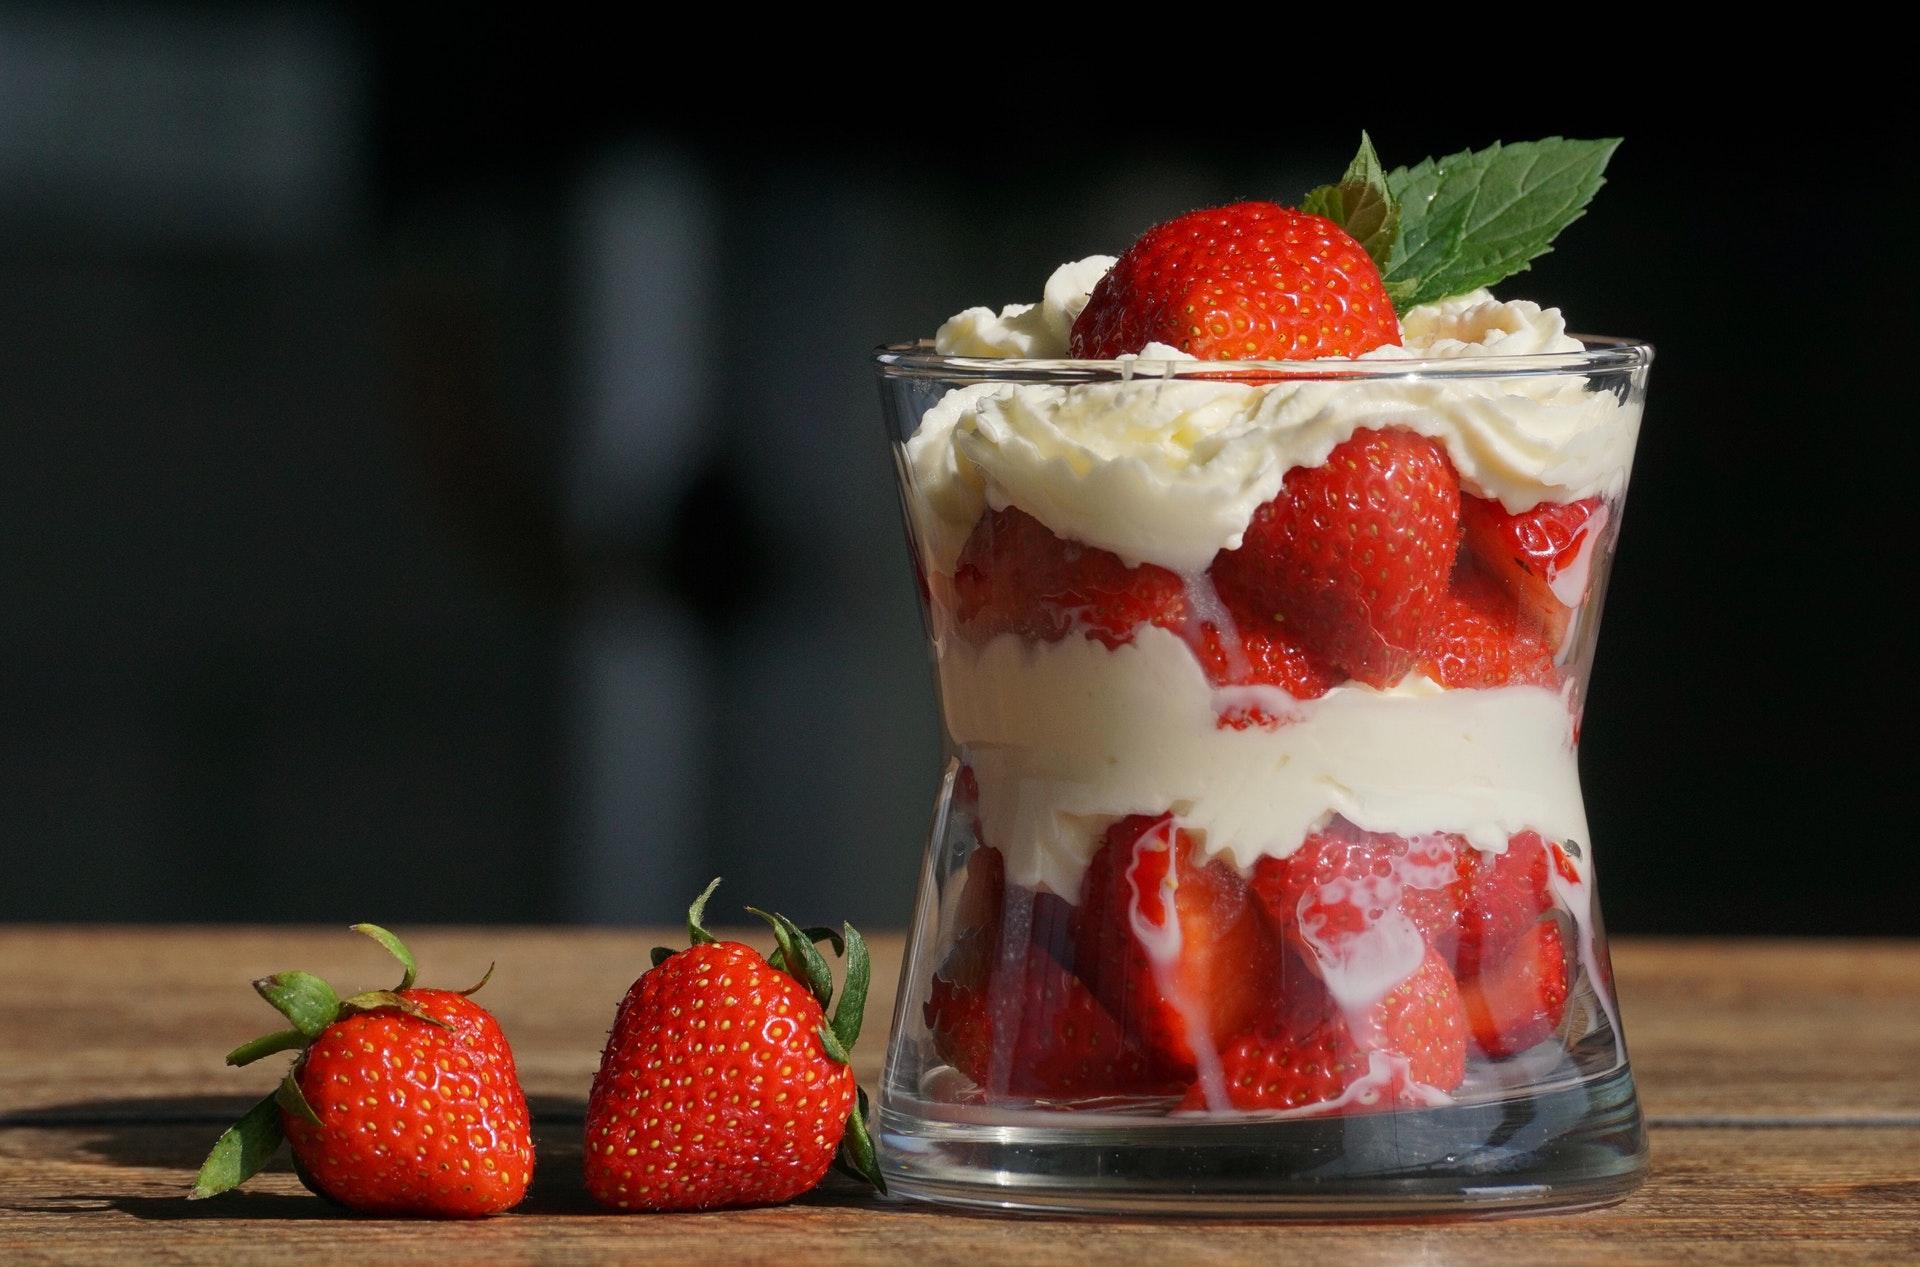 Delicious strawberry dessert which easy to make